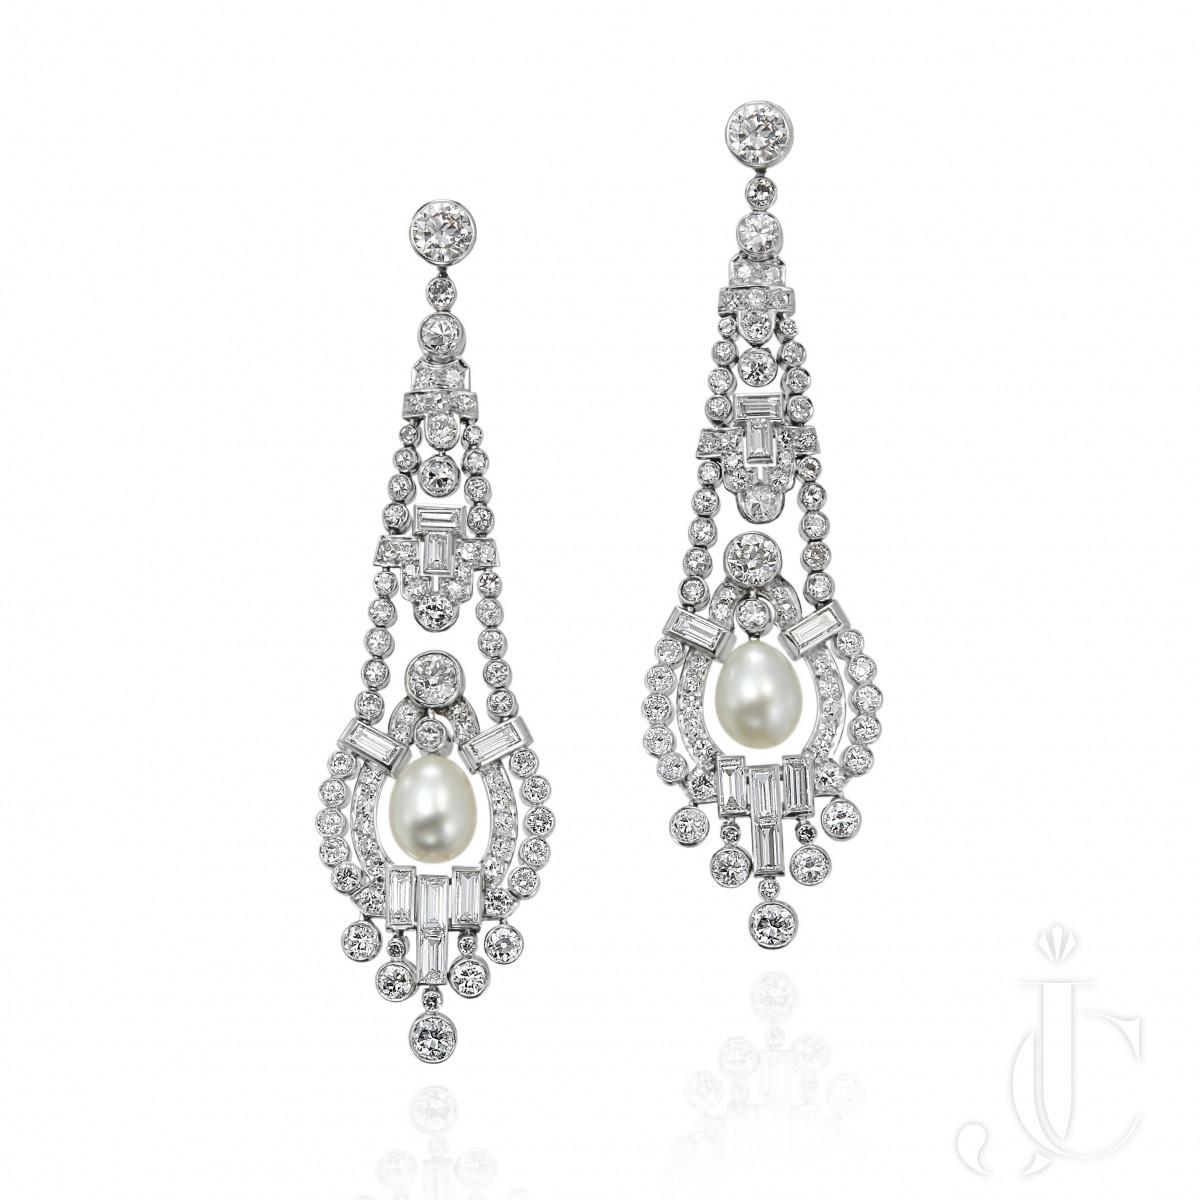 Art Deco Natural Pearl and Diamond Pendant Earrings